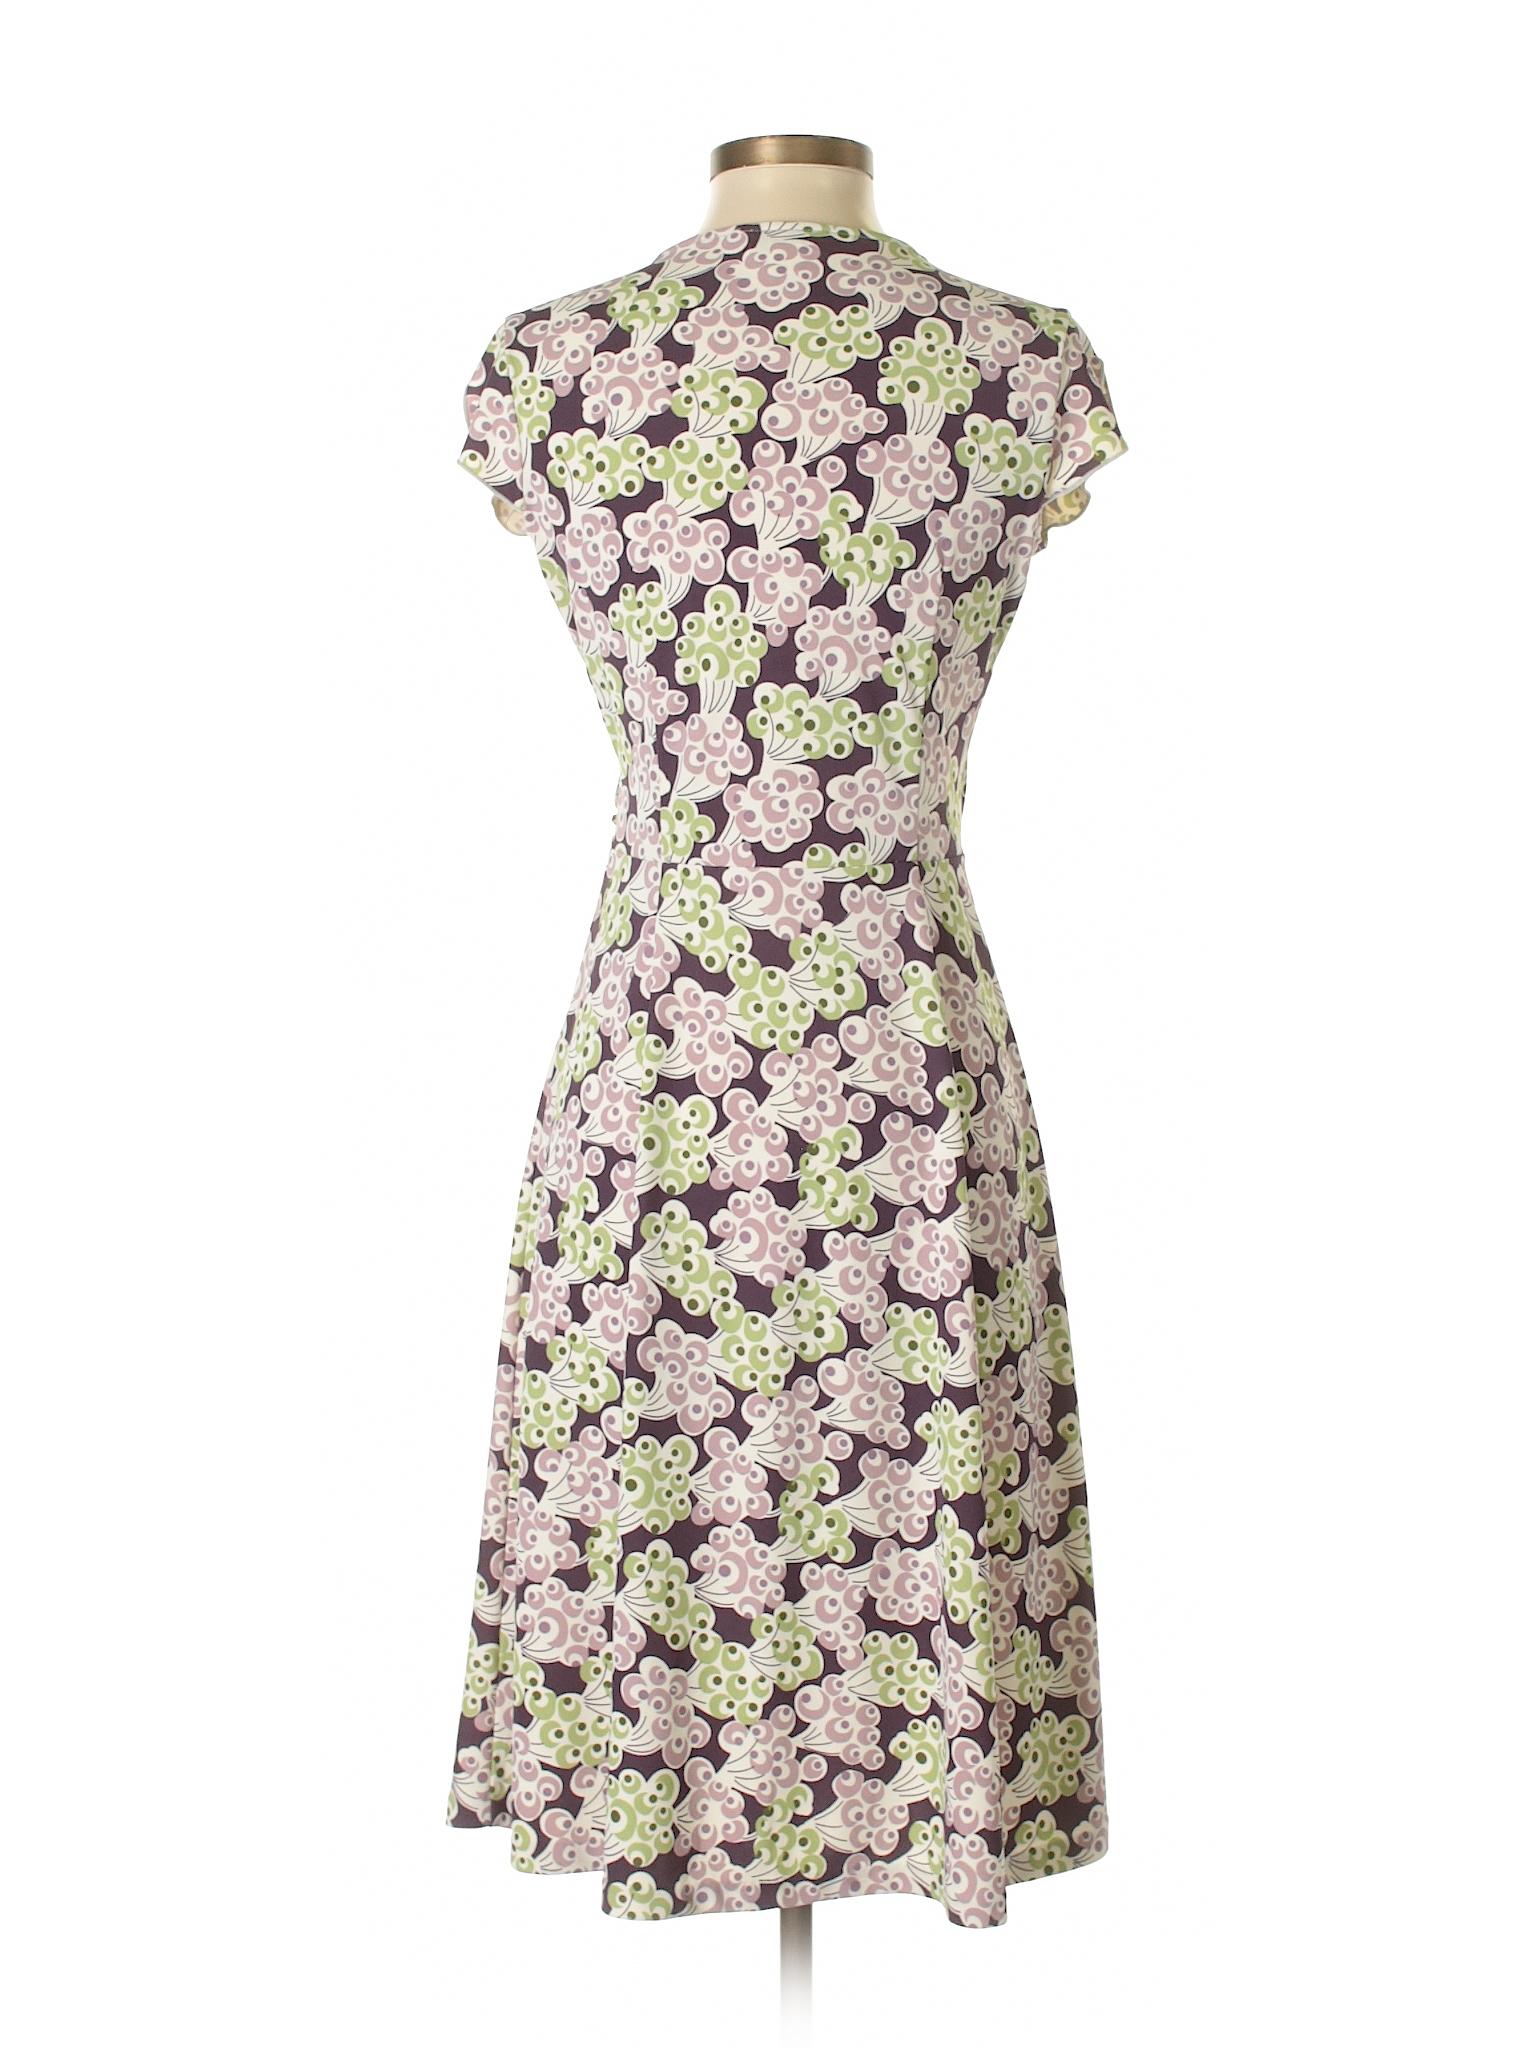 Dress Boutique Taylor Ann winter LOFT Casual 7OqvOFzP